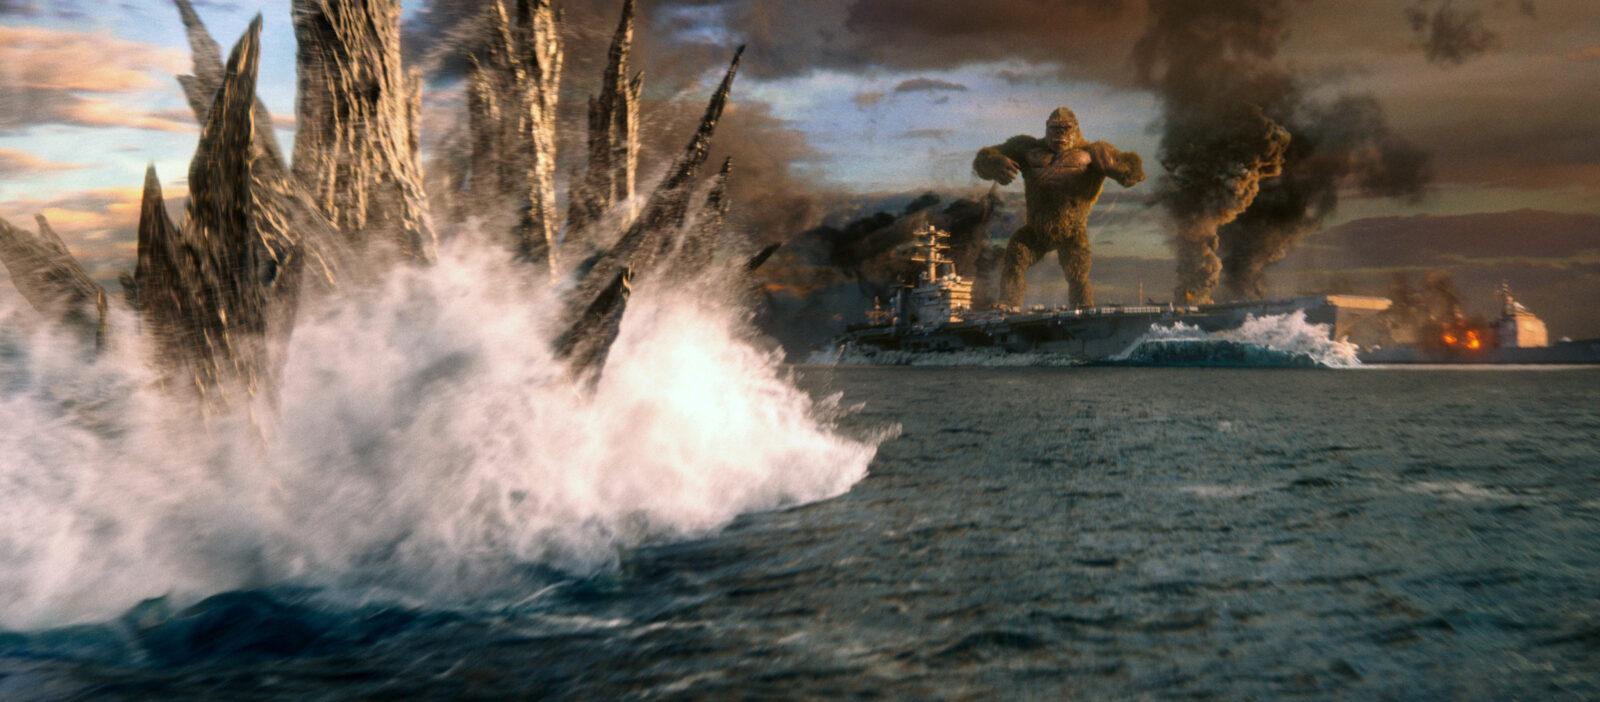 godzilla-vs-kong-first-fight-monsterverse